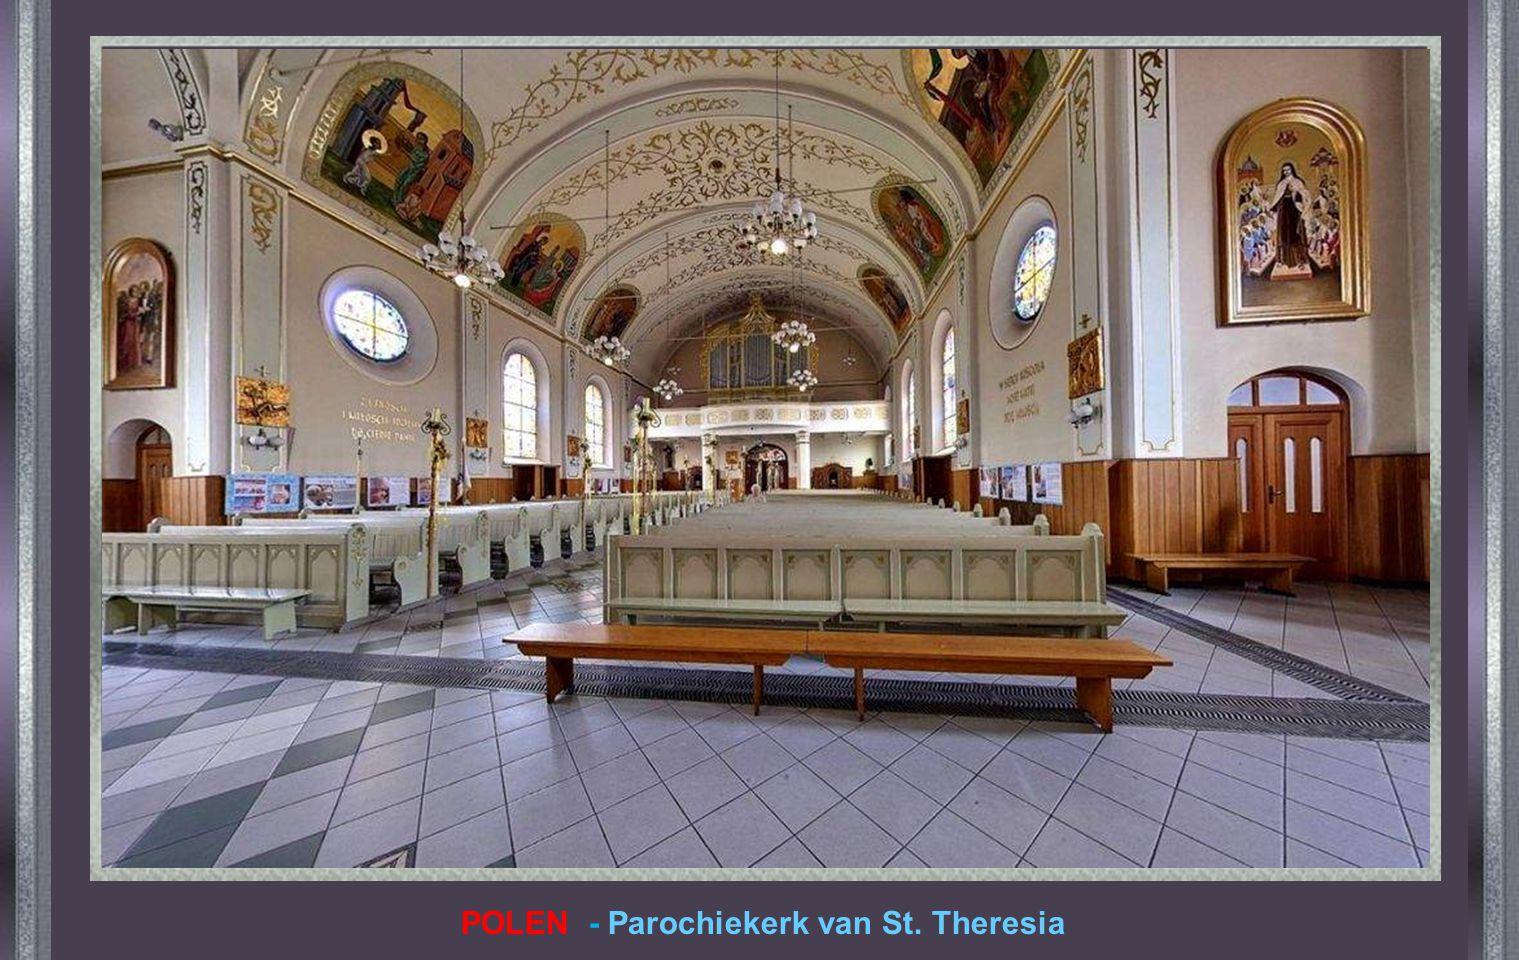 POLEN - Parochiekerk van St. Theresia